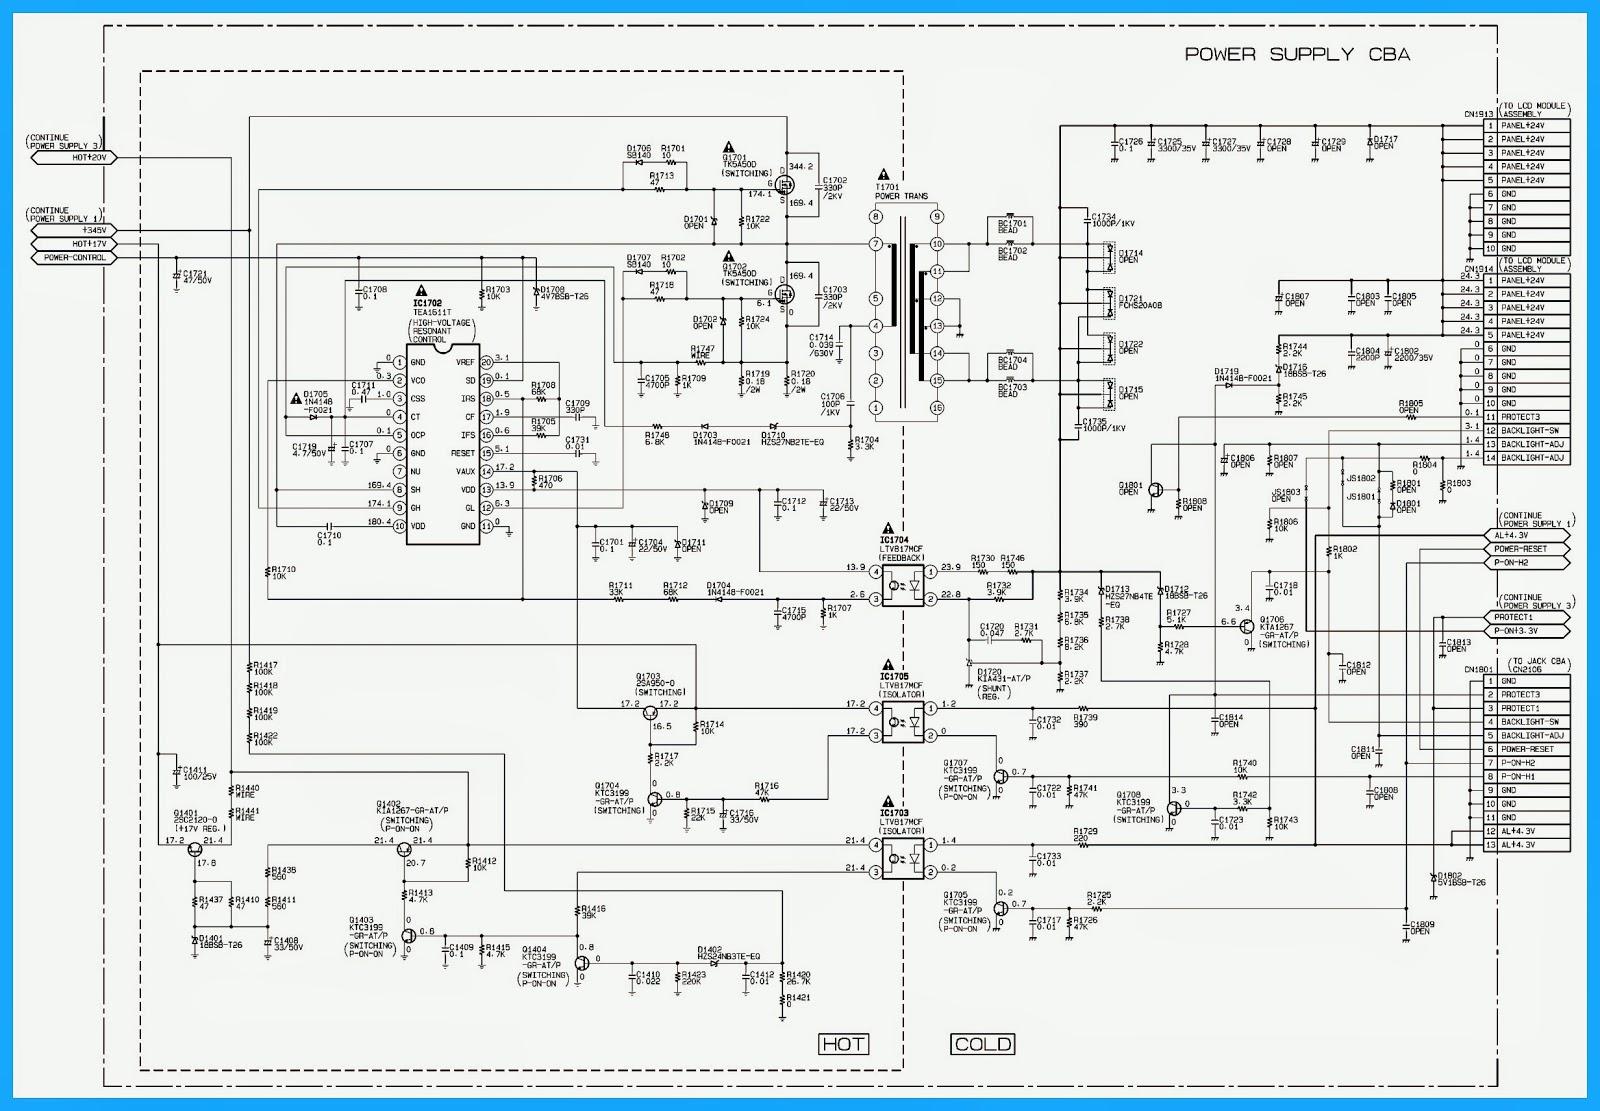 medium resolution of schematic diagram for emerson tvs emerson appliances emerson tv input emerson tv remote